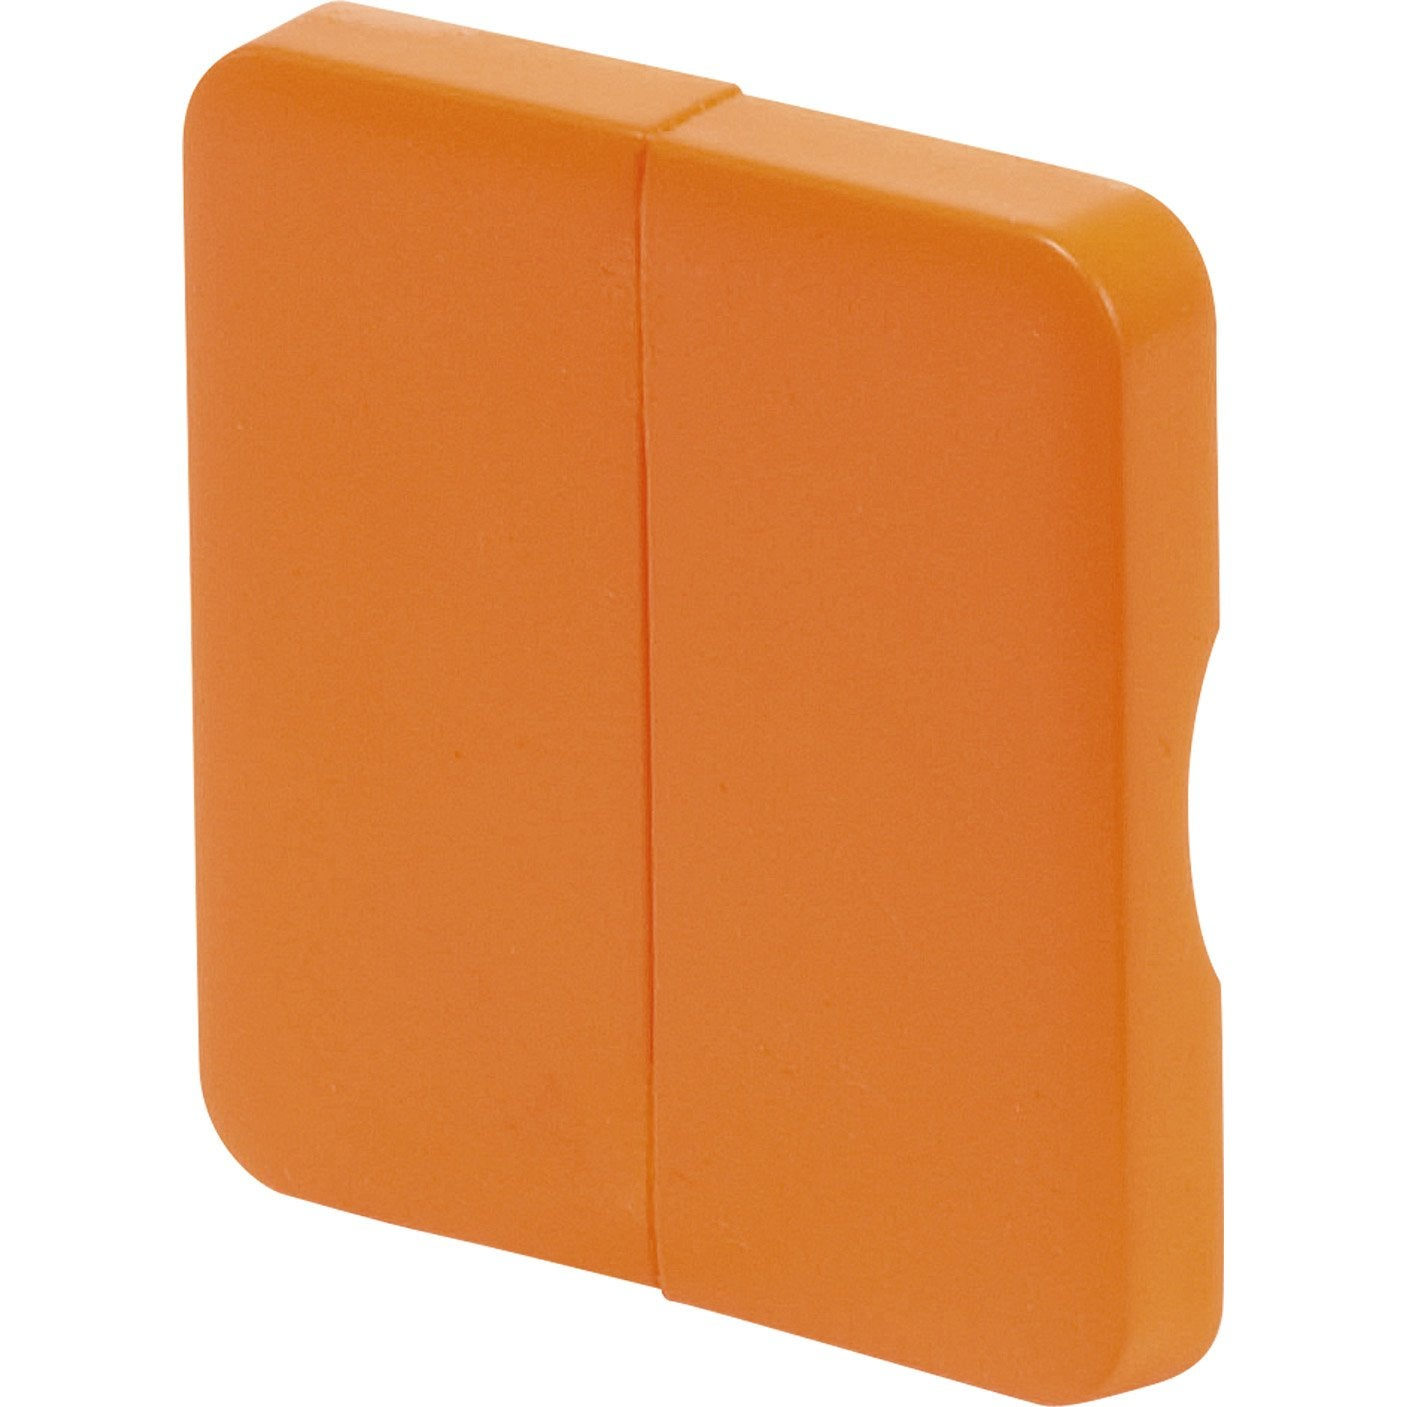 Cache commande d 39 clairage double cosy lexman orange tangerine n 3 mat leroy merlin - Cache clim leroy merlin ...